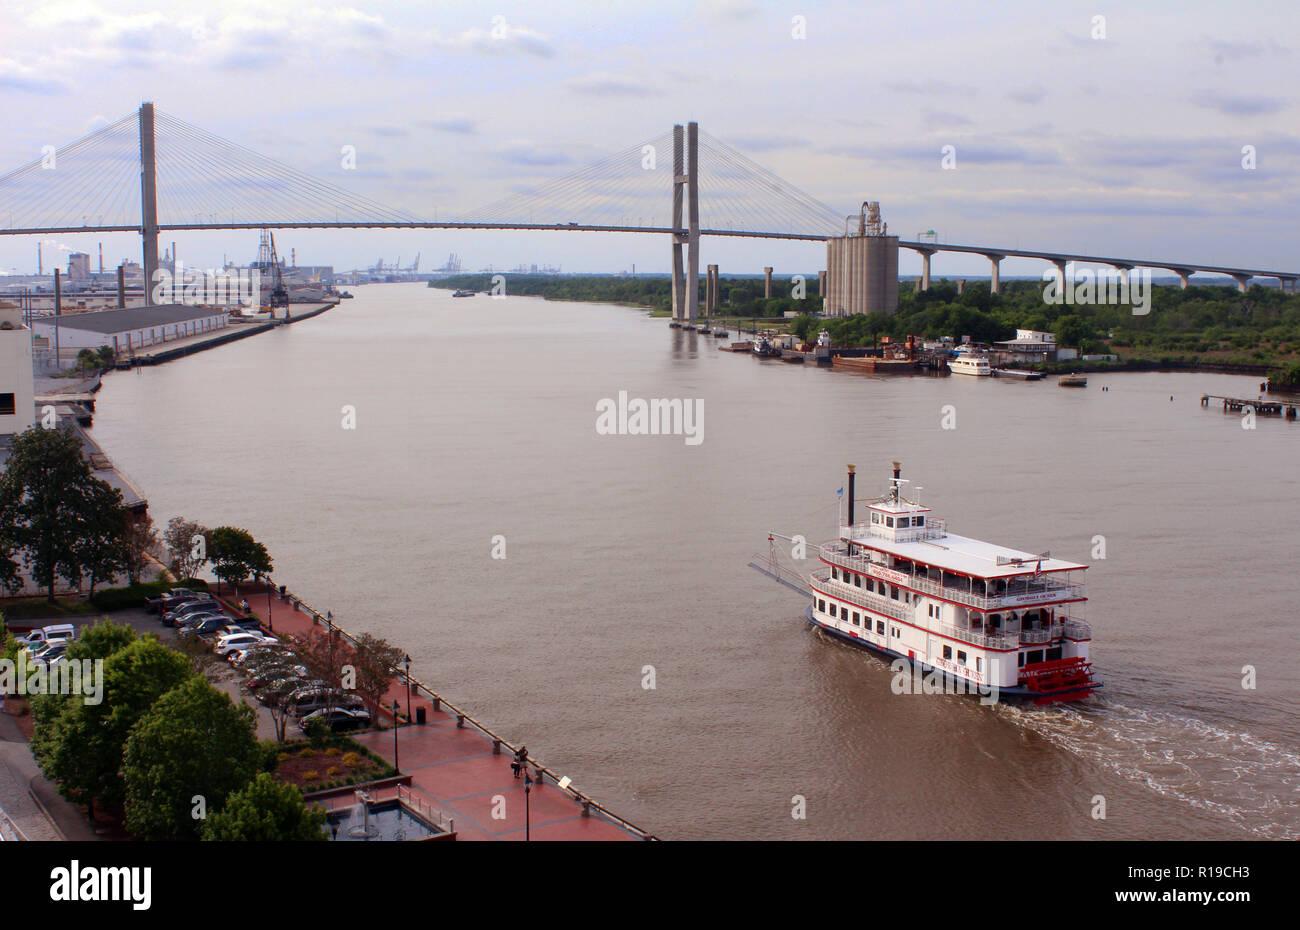 View of Savannah River channel and Talmadge Memorial Bridge from above historic River Street, Savannah, Georgia - Stock Image